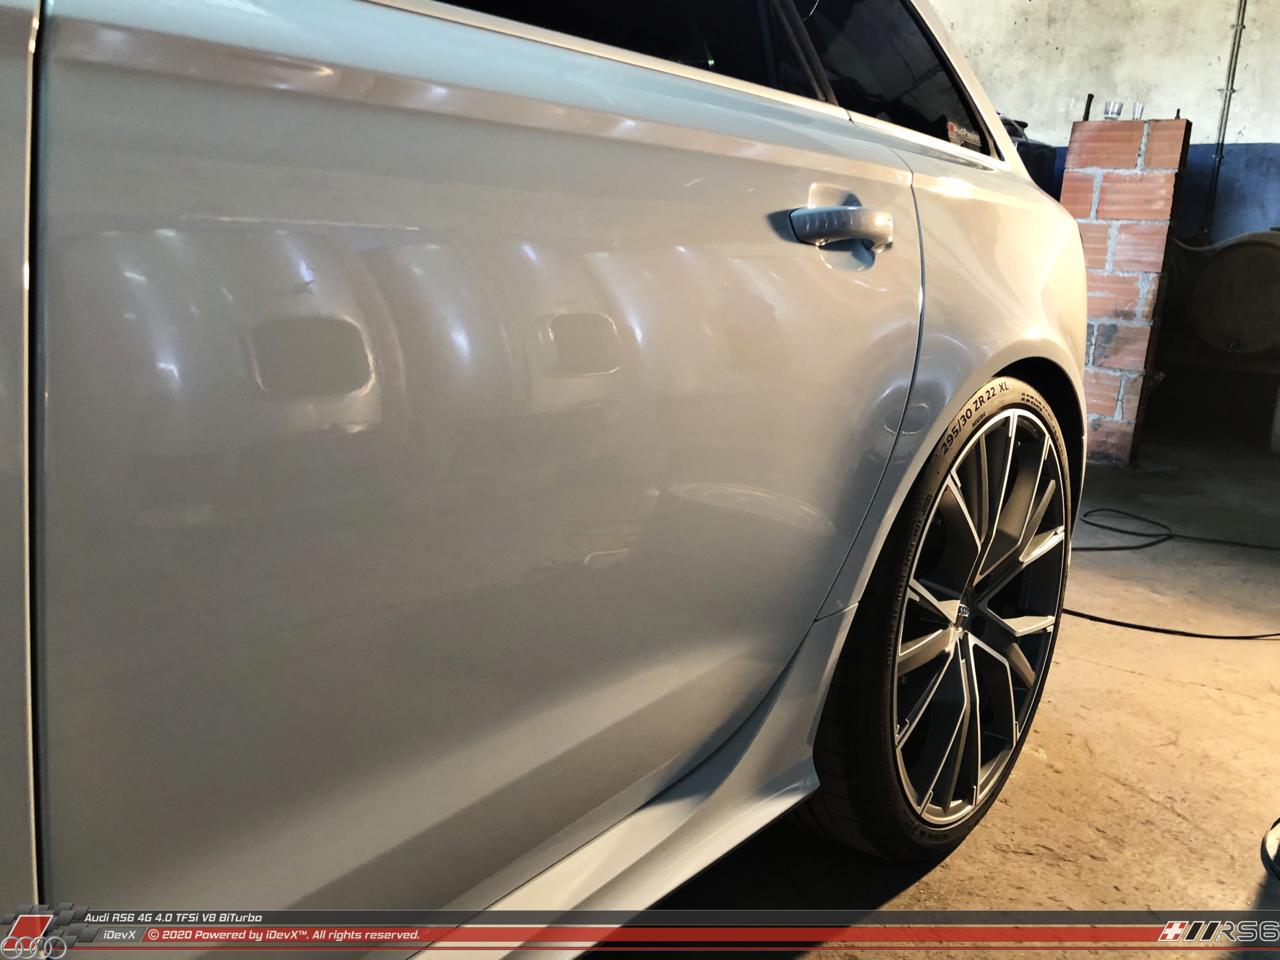 05_08.2019_Audi-RS6_iDevX_005.png